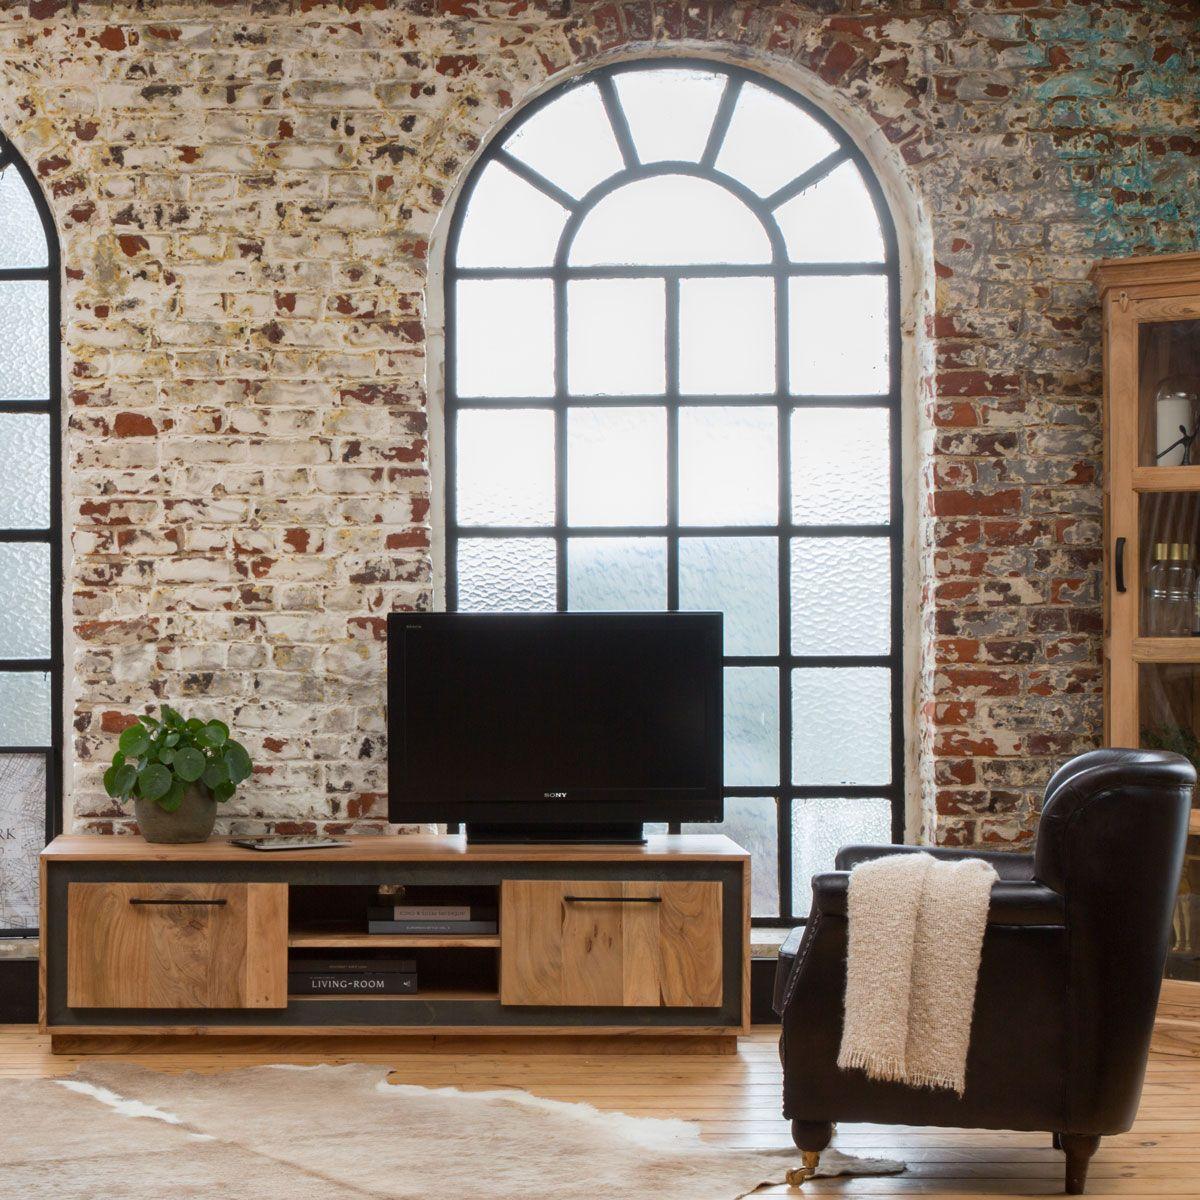 Meuble Tv 2 Portes 2 Niches Acacia Et Contour Noir En 2020 Meuble Tv Meuble Et Meuble Tv Bois